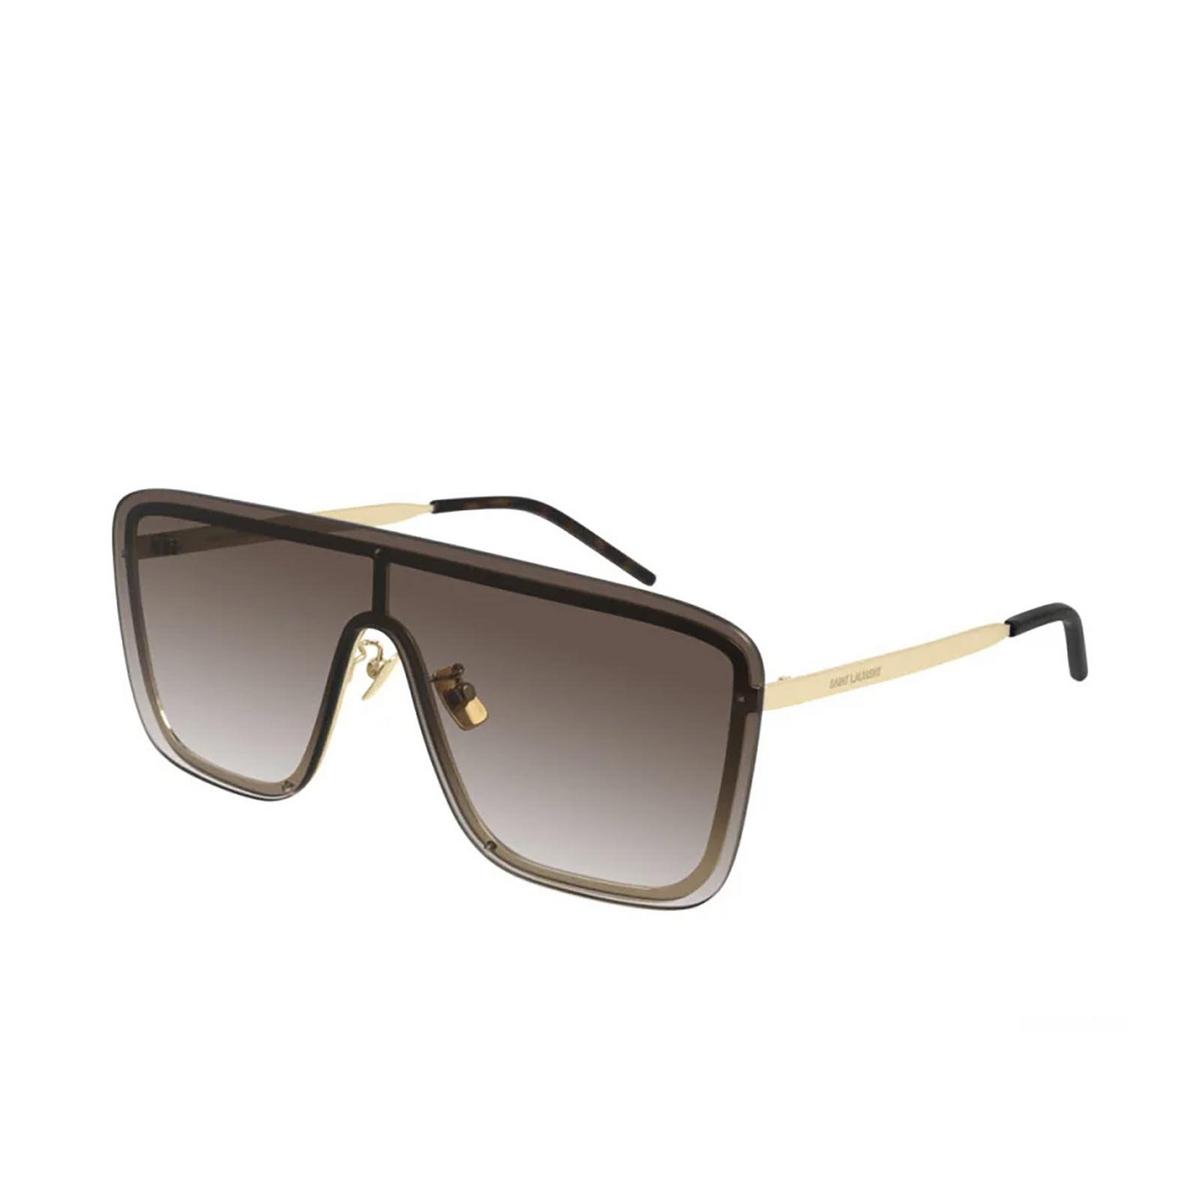 Saint Laurent® Mask Sunglasses: SL 364 MASK color Gold 006 - three-quarters view.